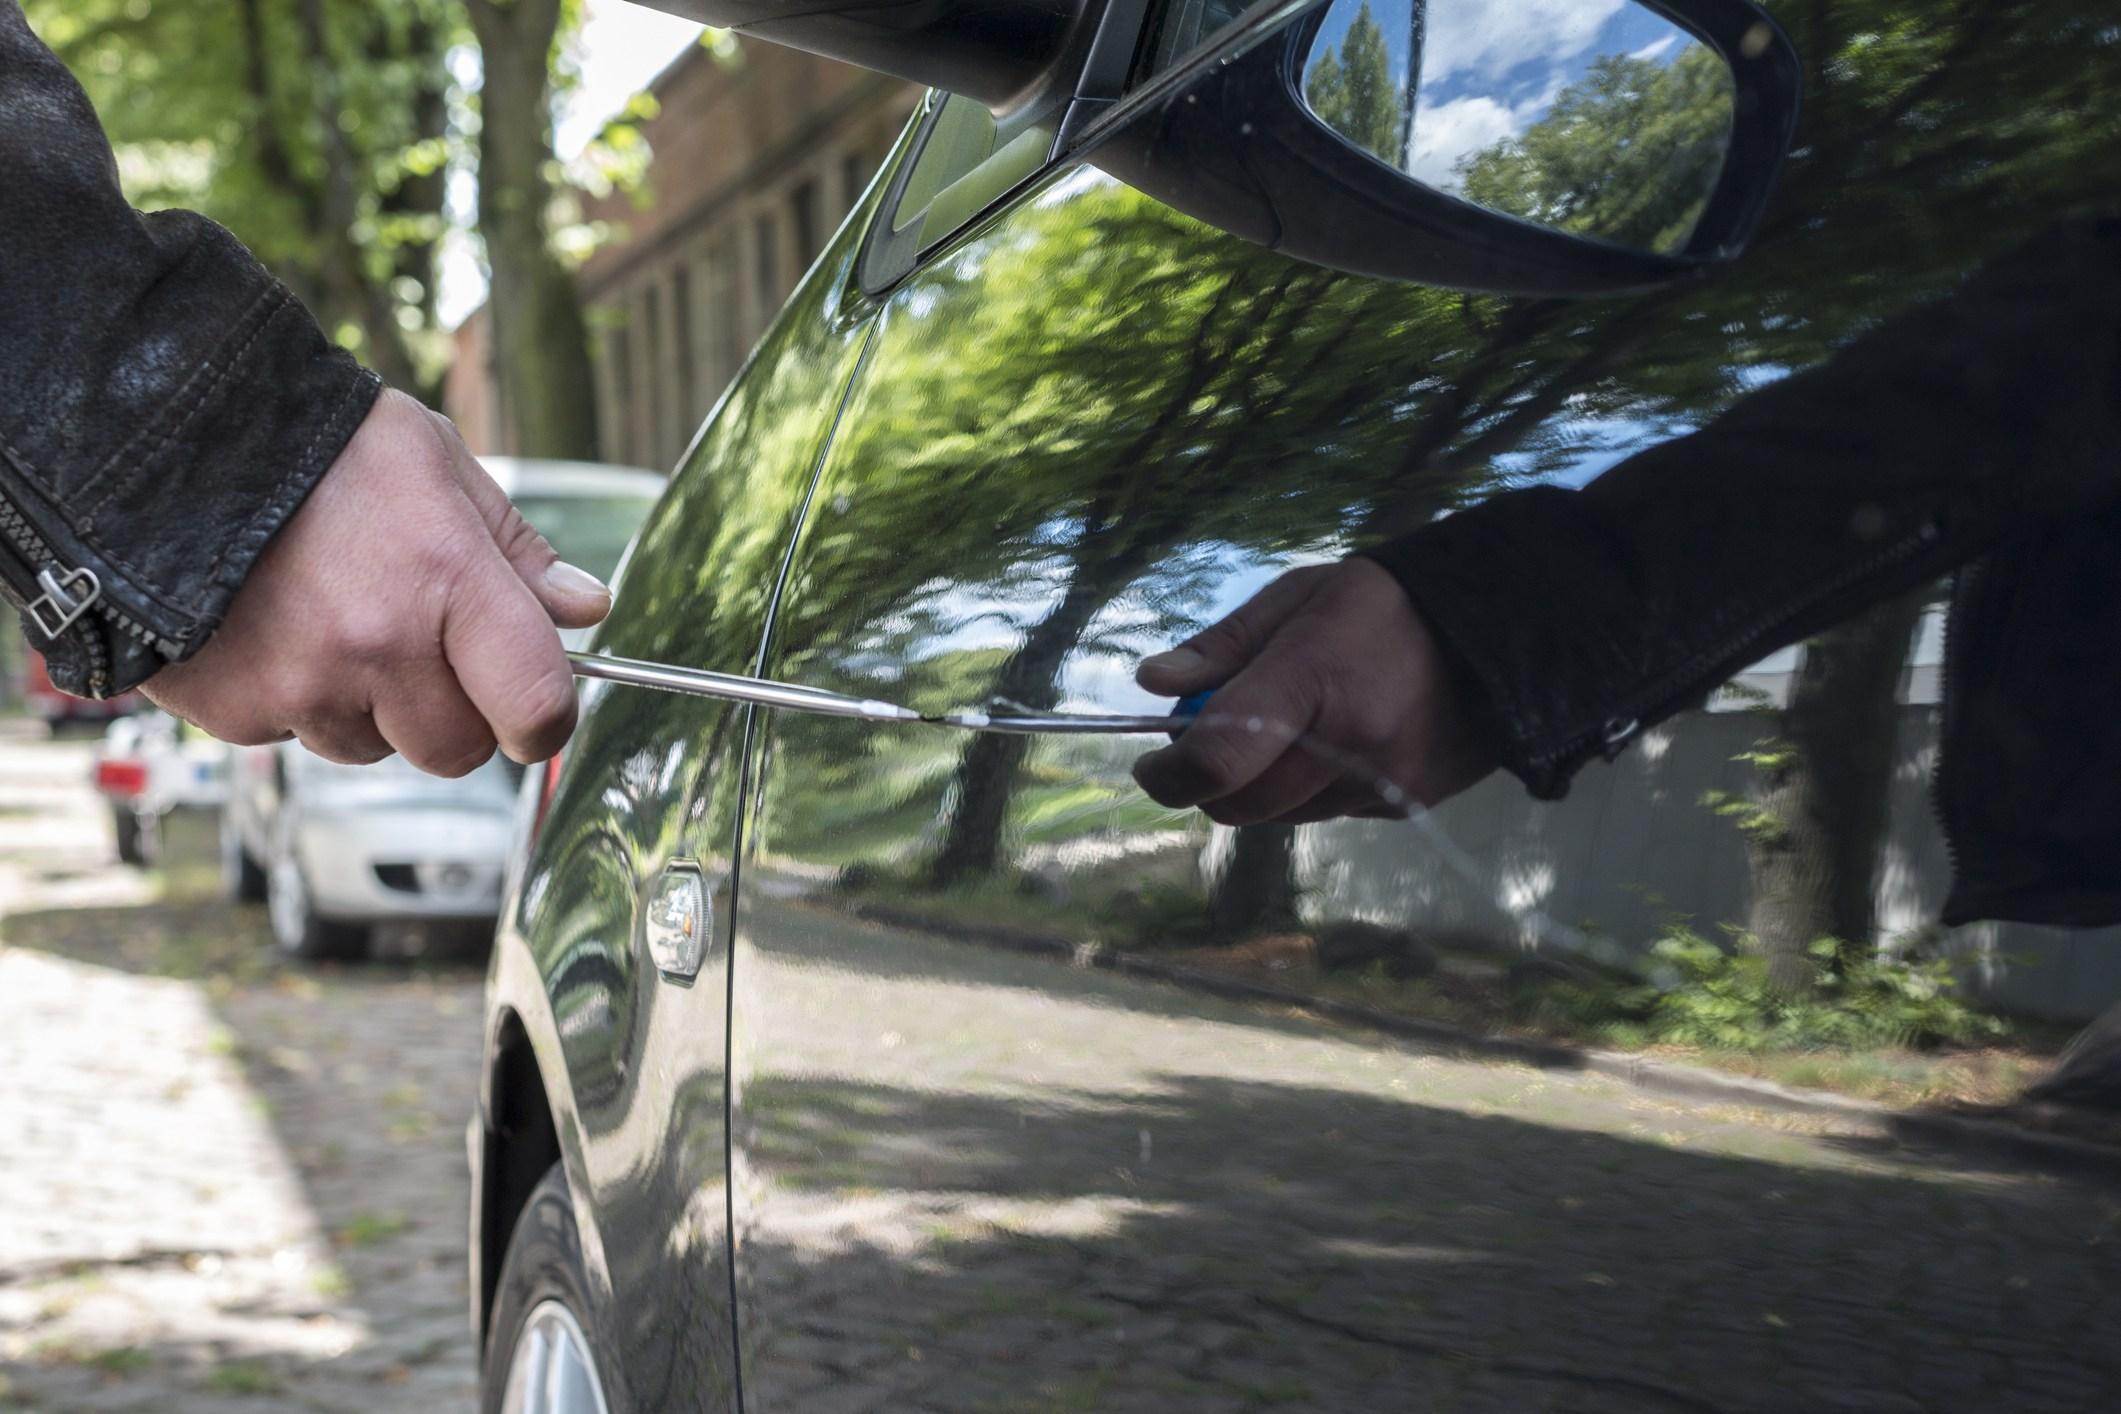 A person vandalizing a car